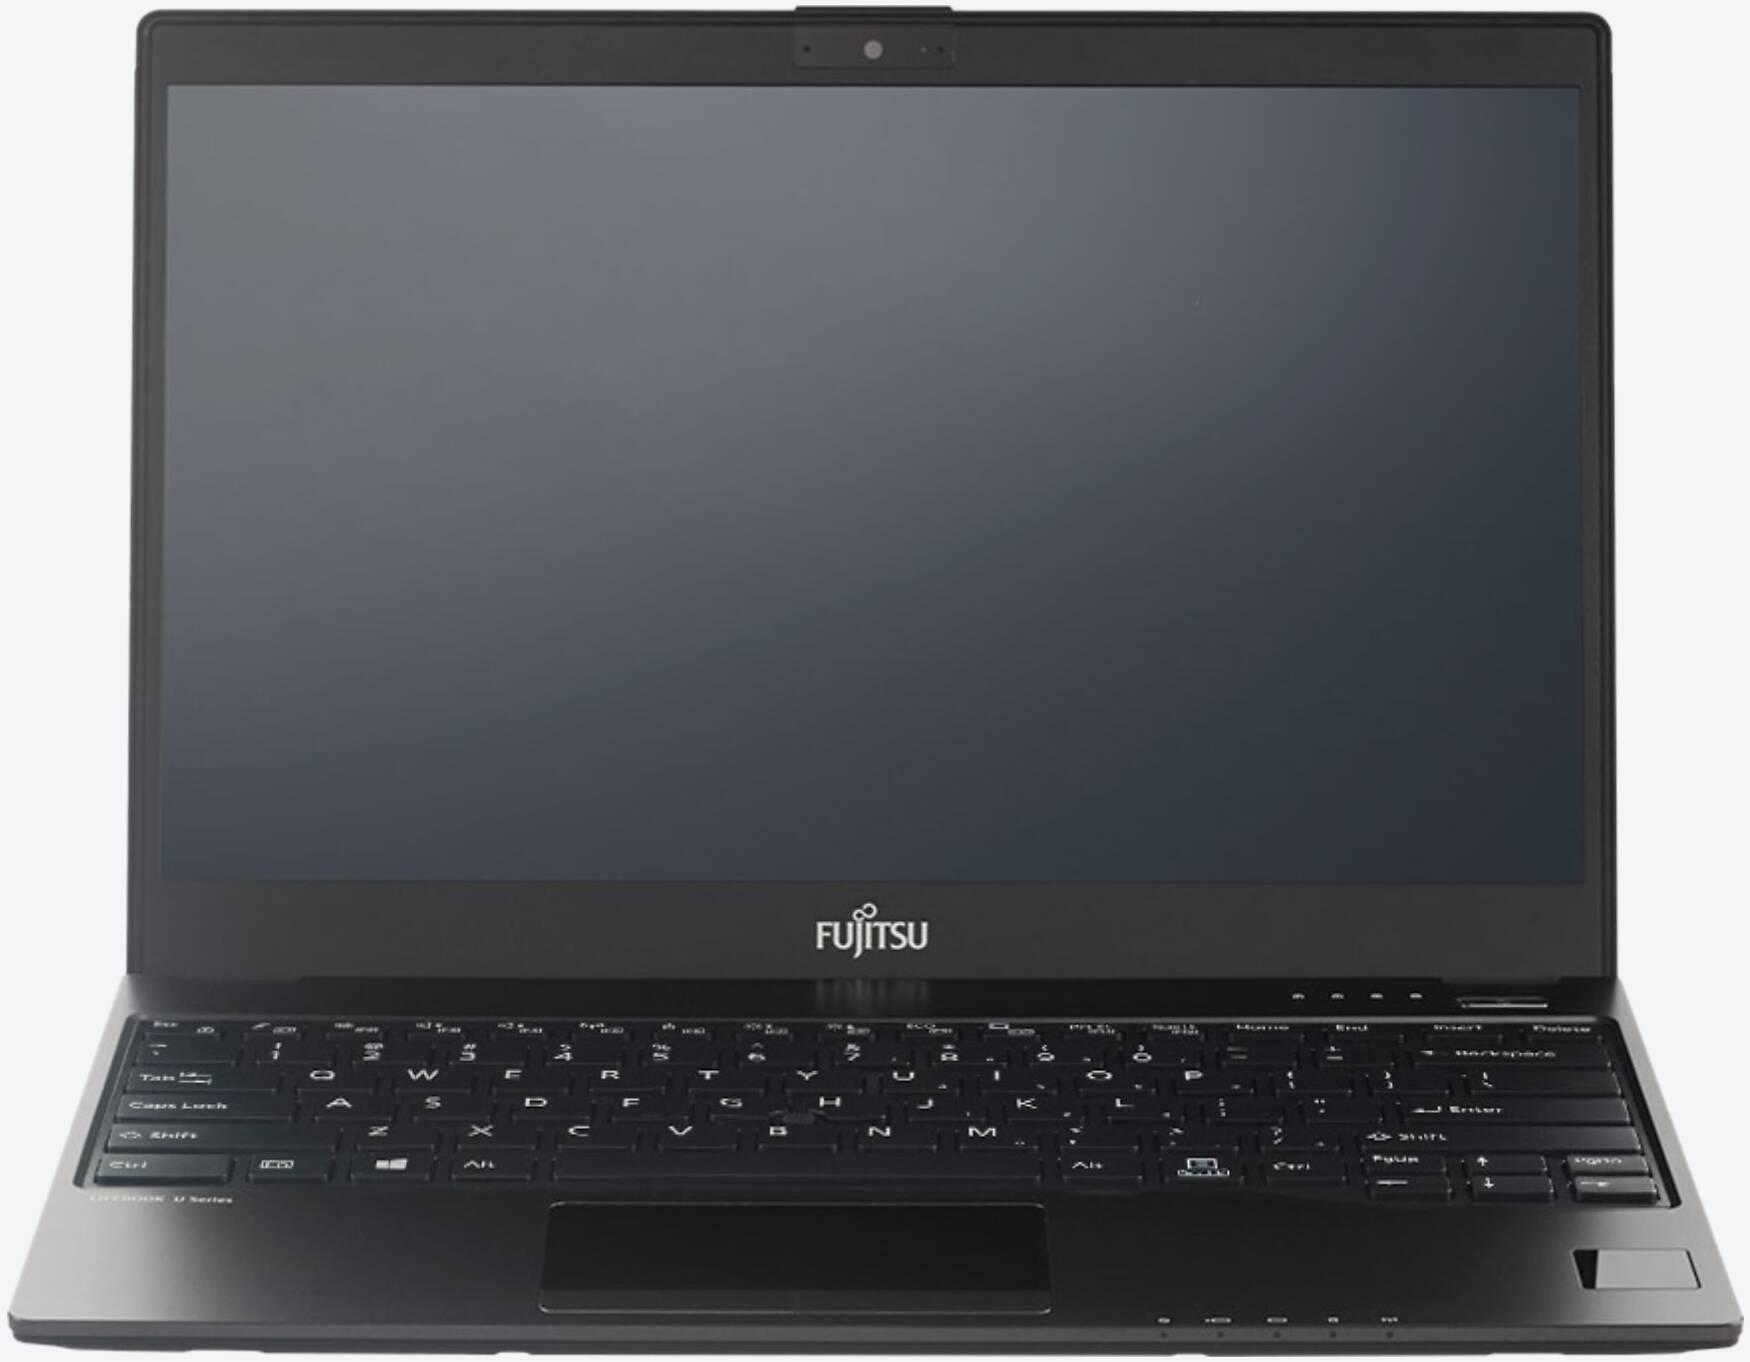 Fujitsu LIFEBOOK U938 Intel Core i7 1.9 GHz 20GB RAM 512GB Win10 Pro LTE Schwarz